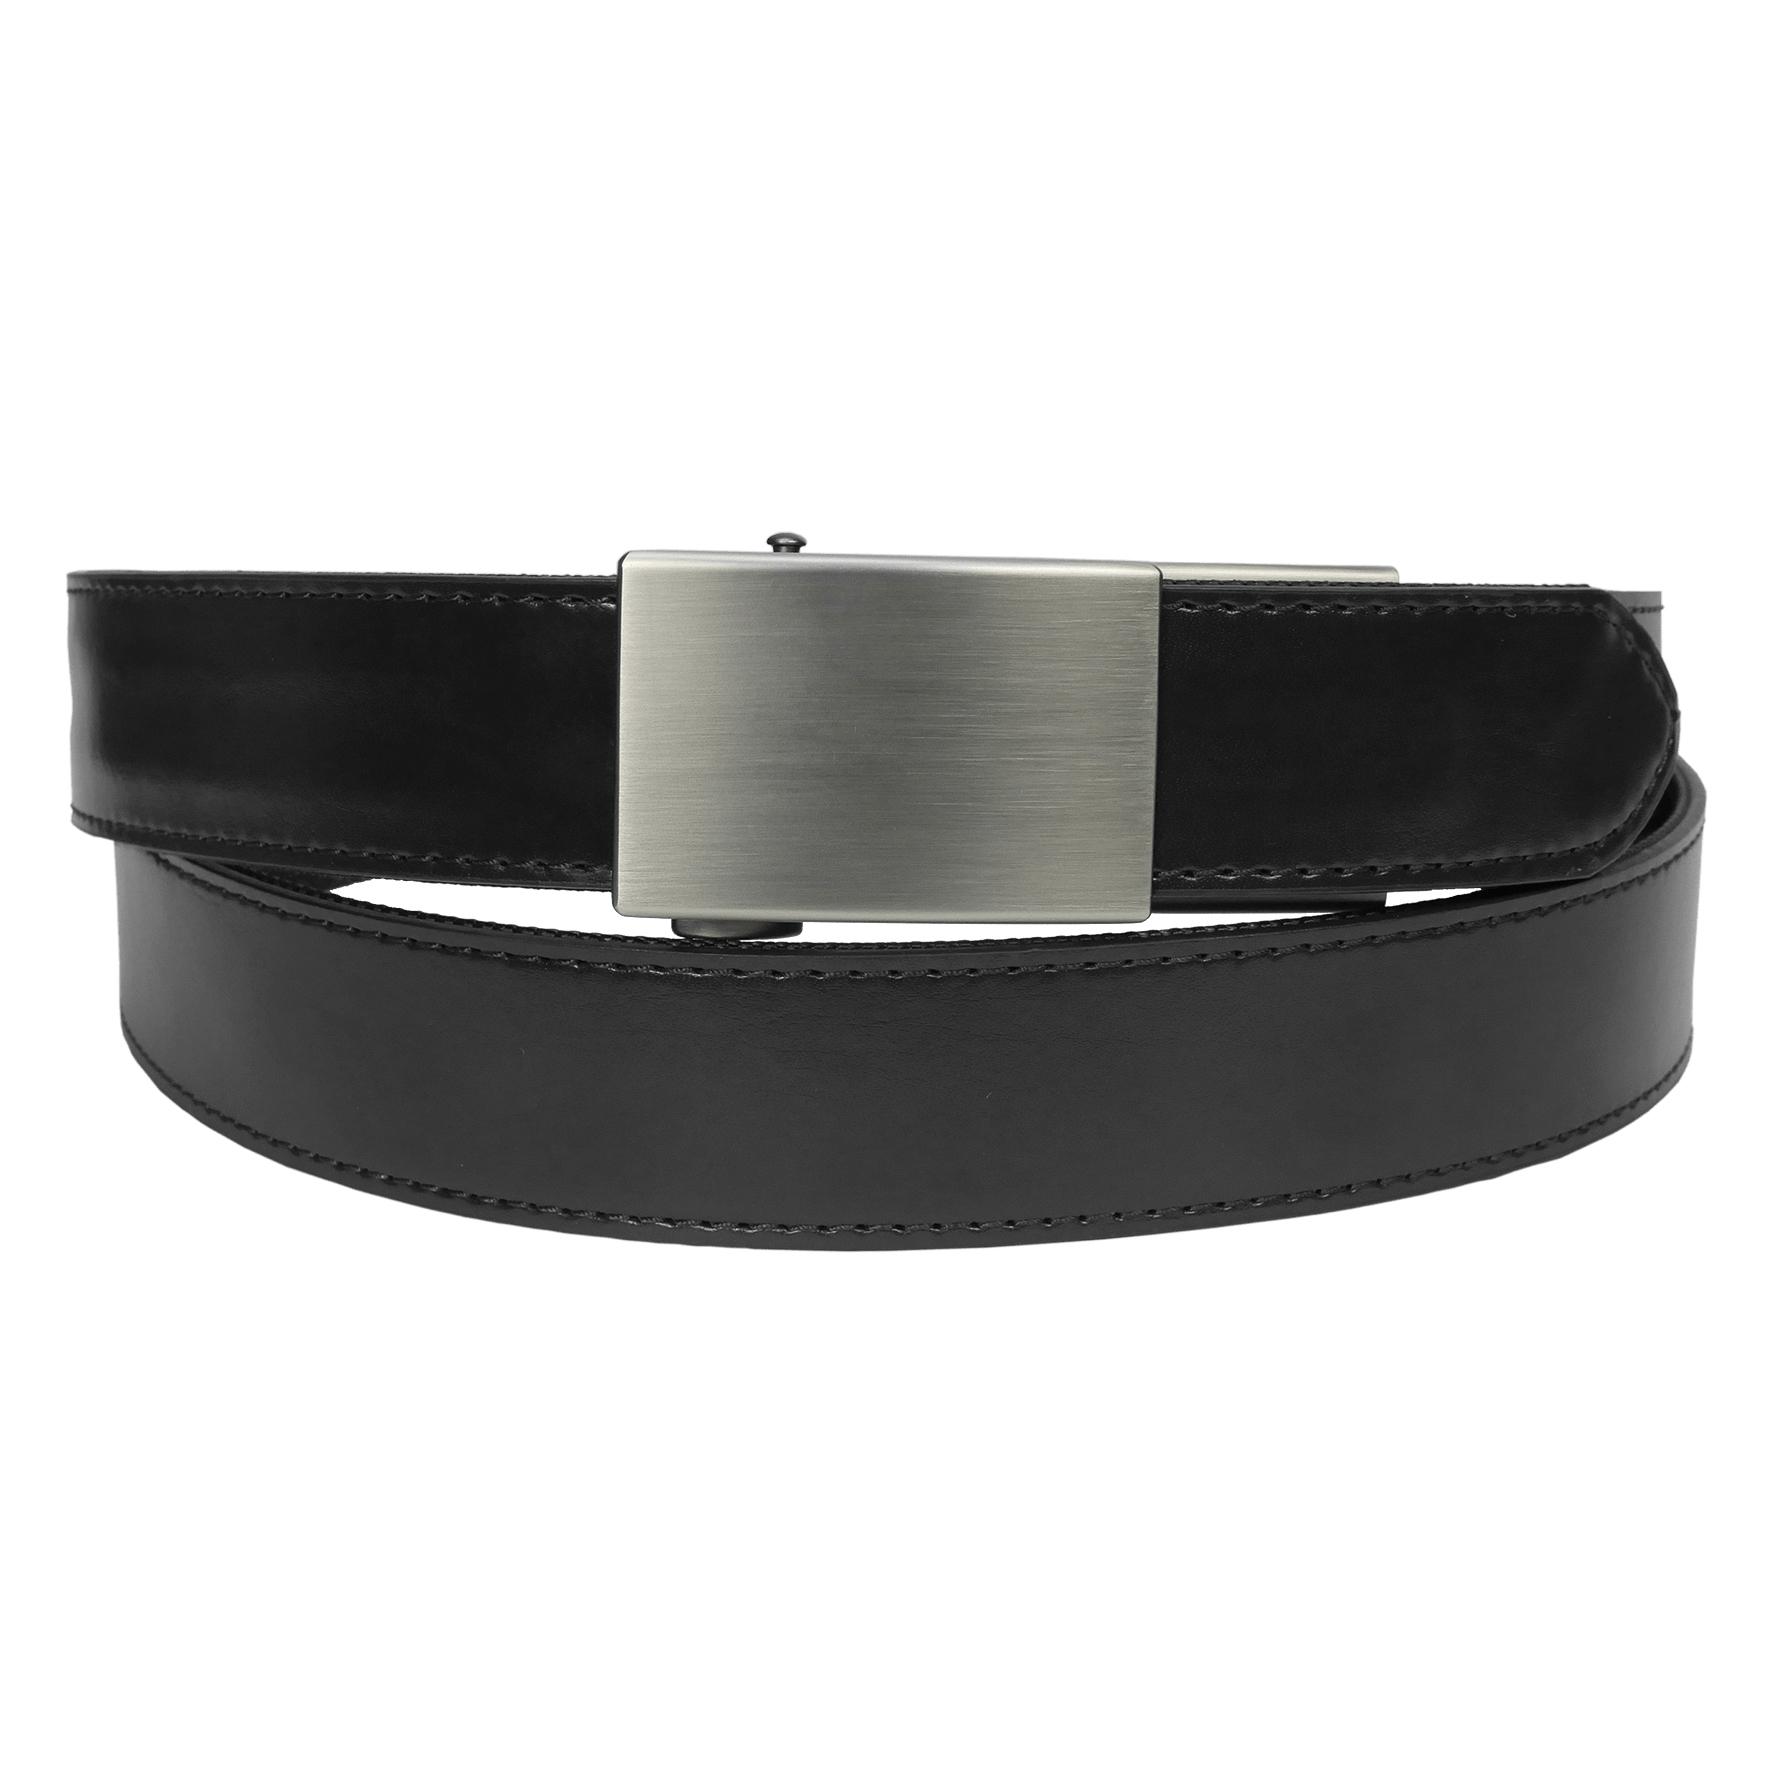 Blade-Tech Ultimate Carry Belt, Black Leather